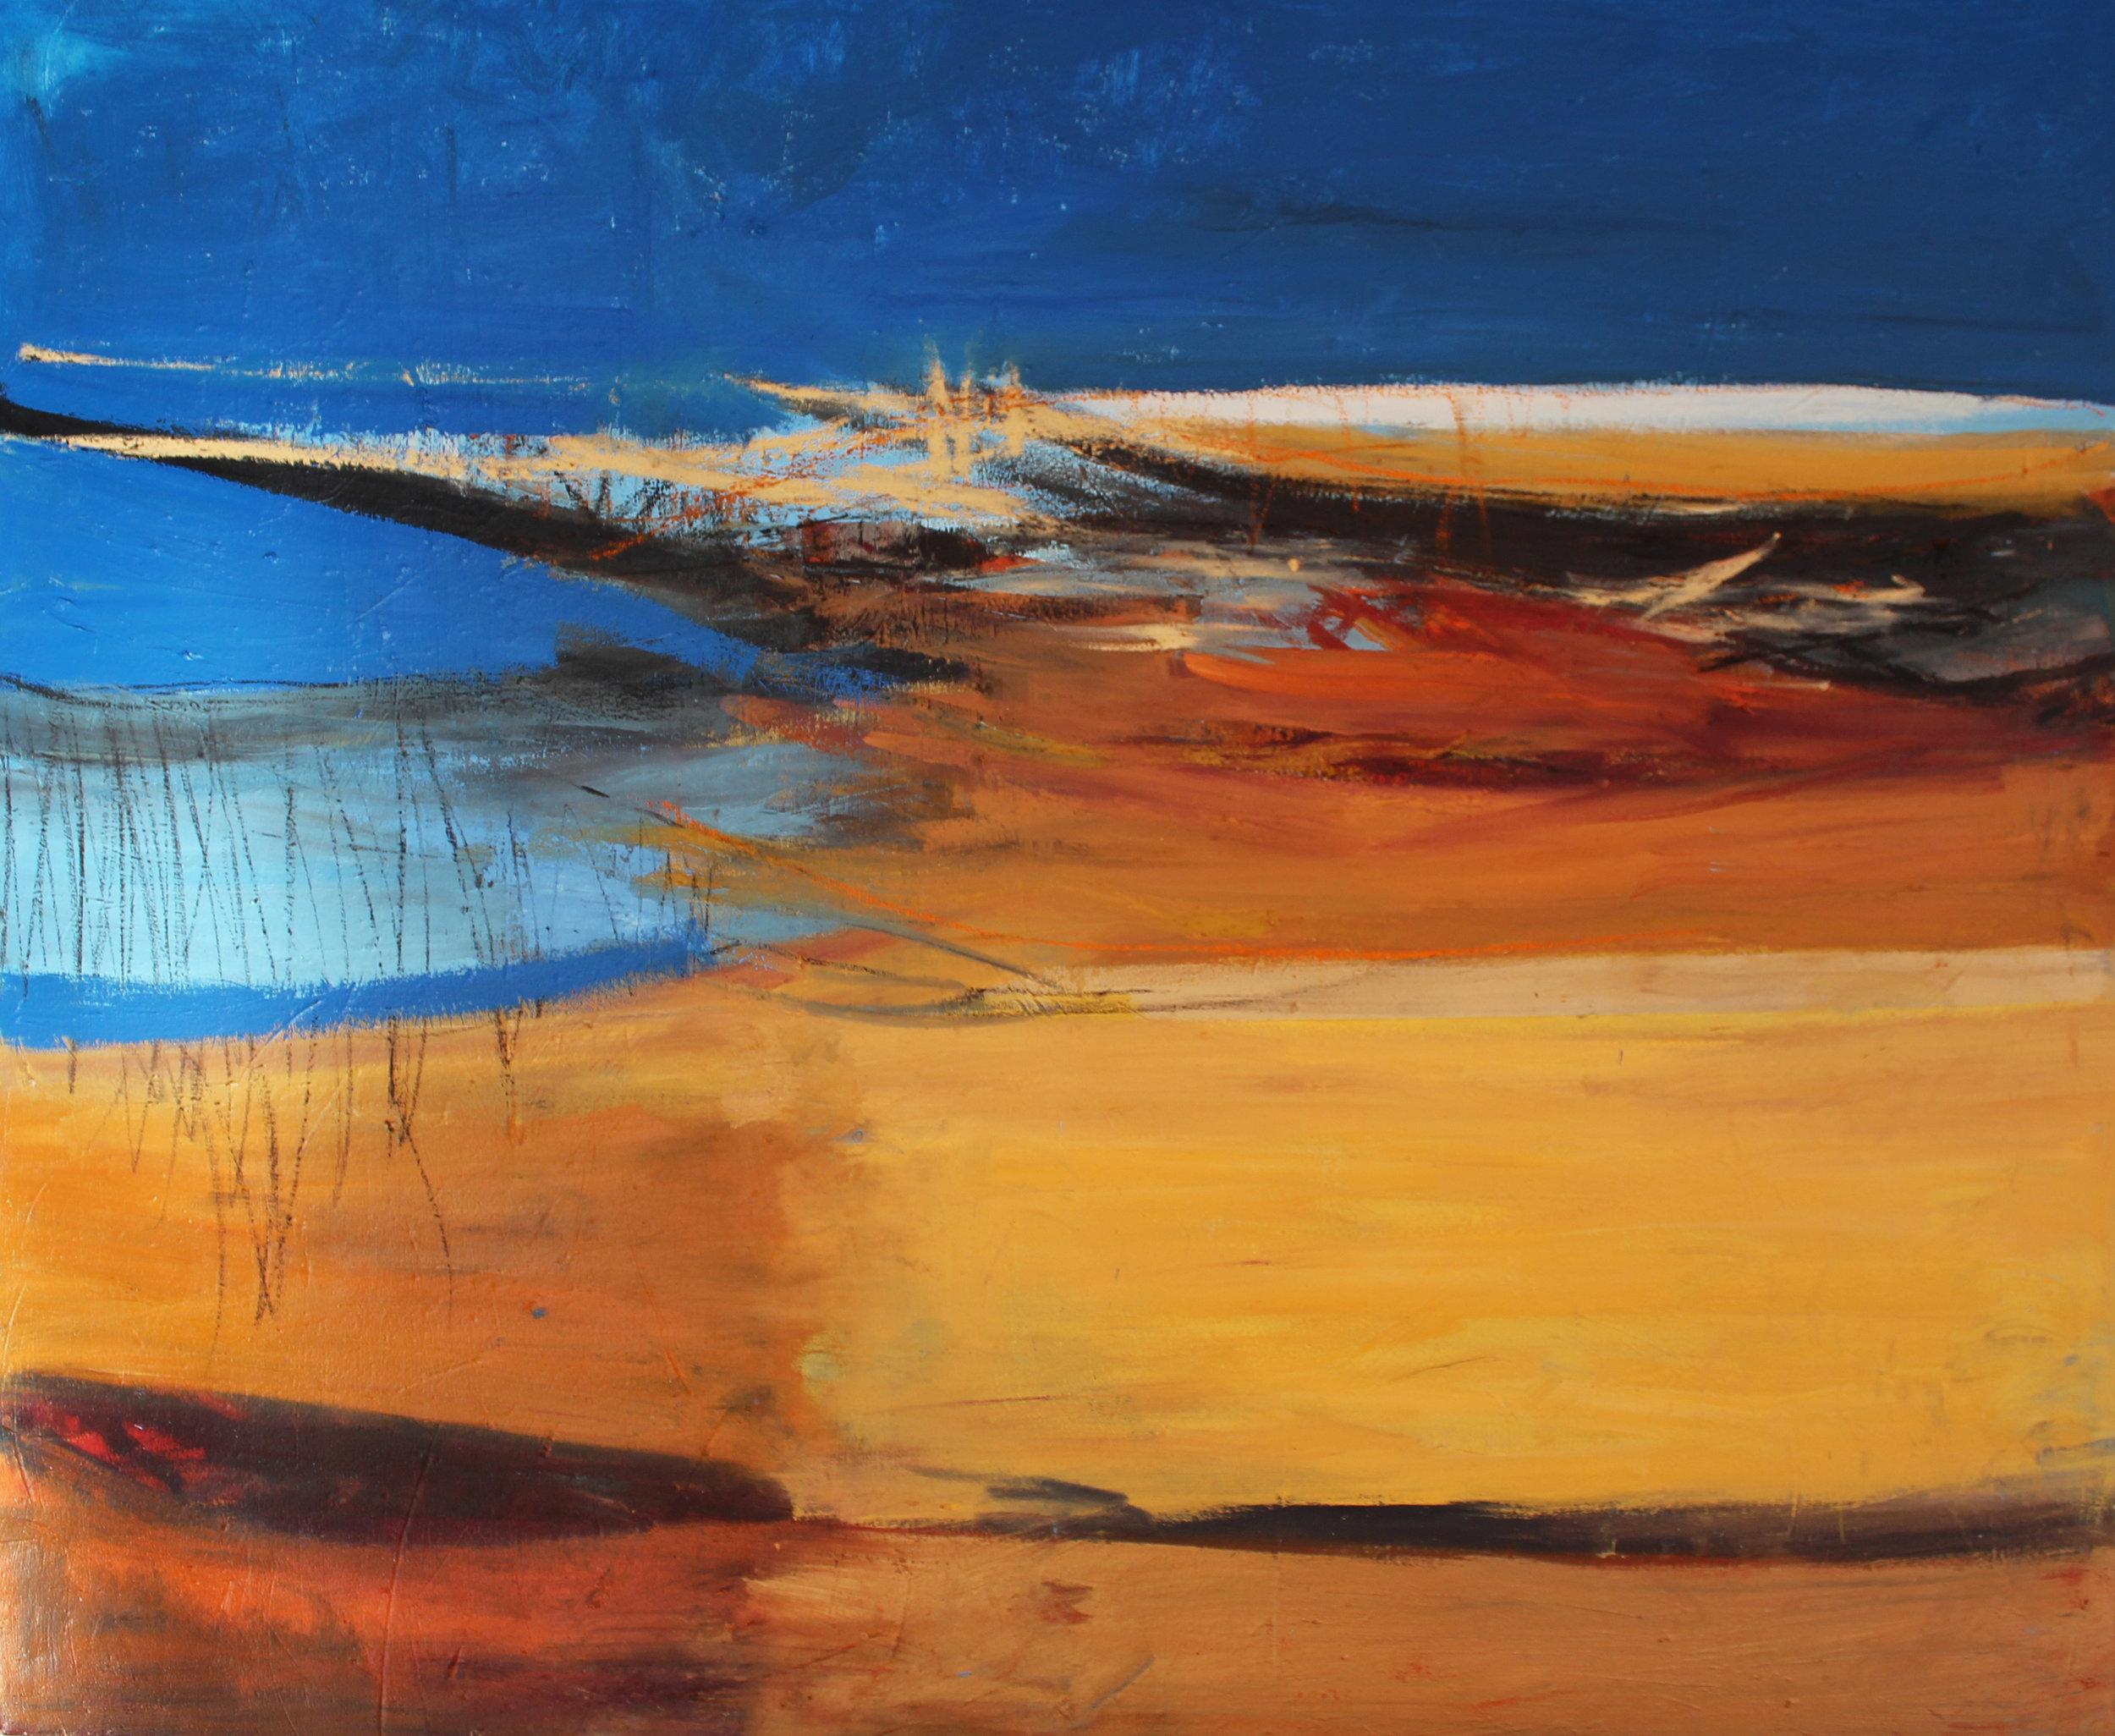 Painting_2_Elizabeth Diaz_Considering_Beckley_58%22x72%22 copy.jpg